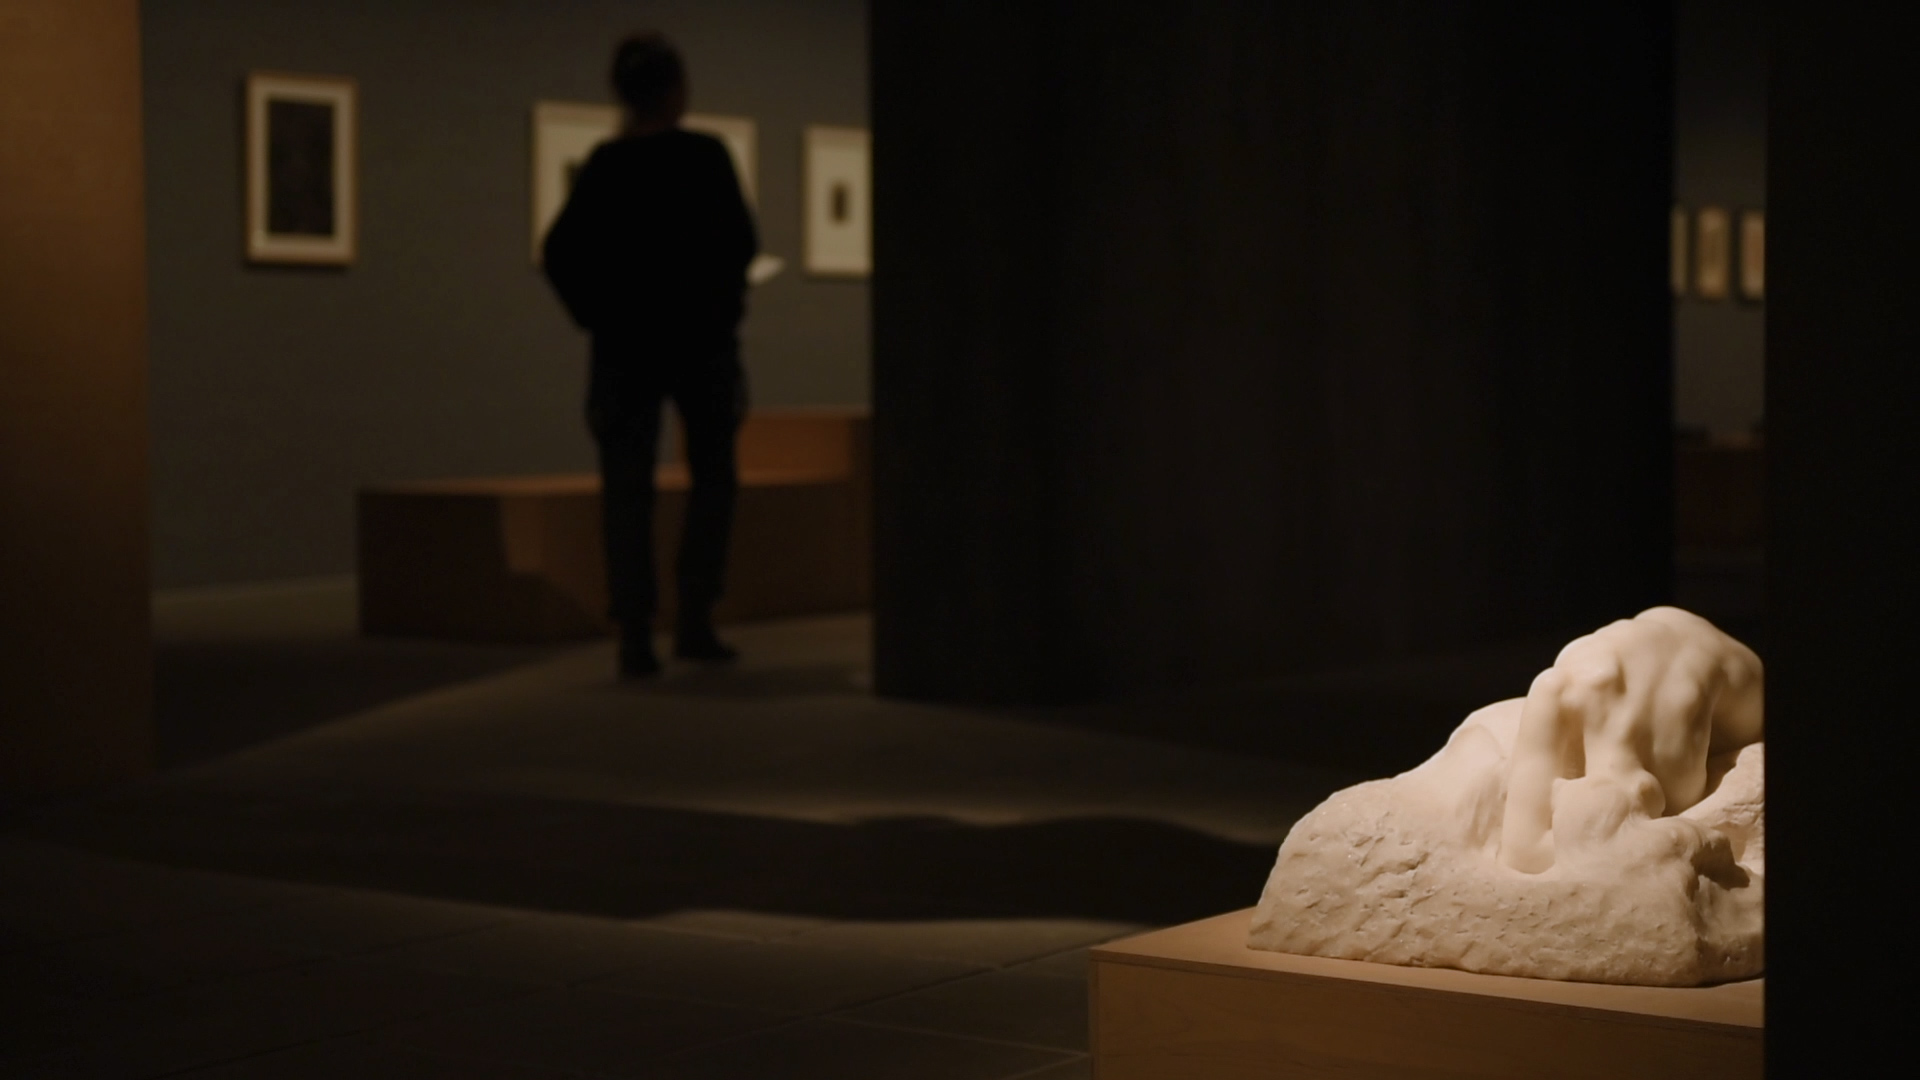 Videos - about art & culture